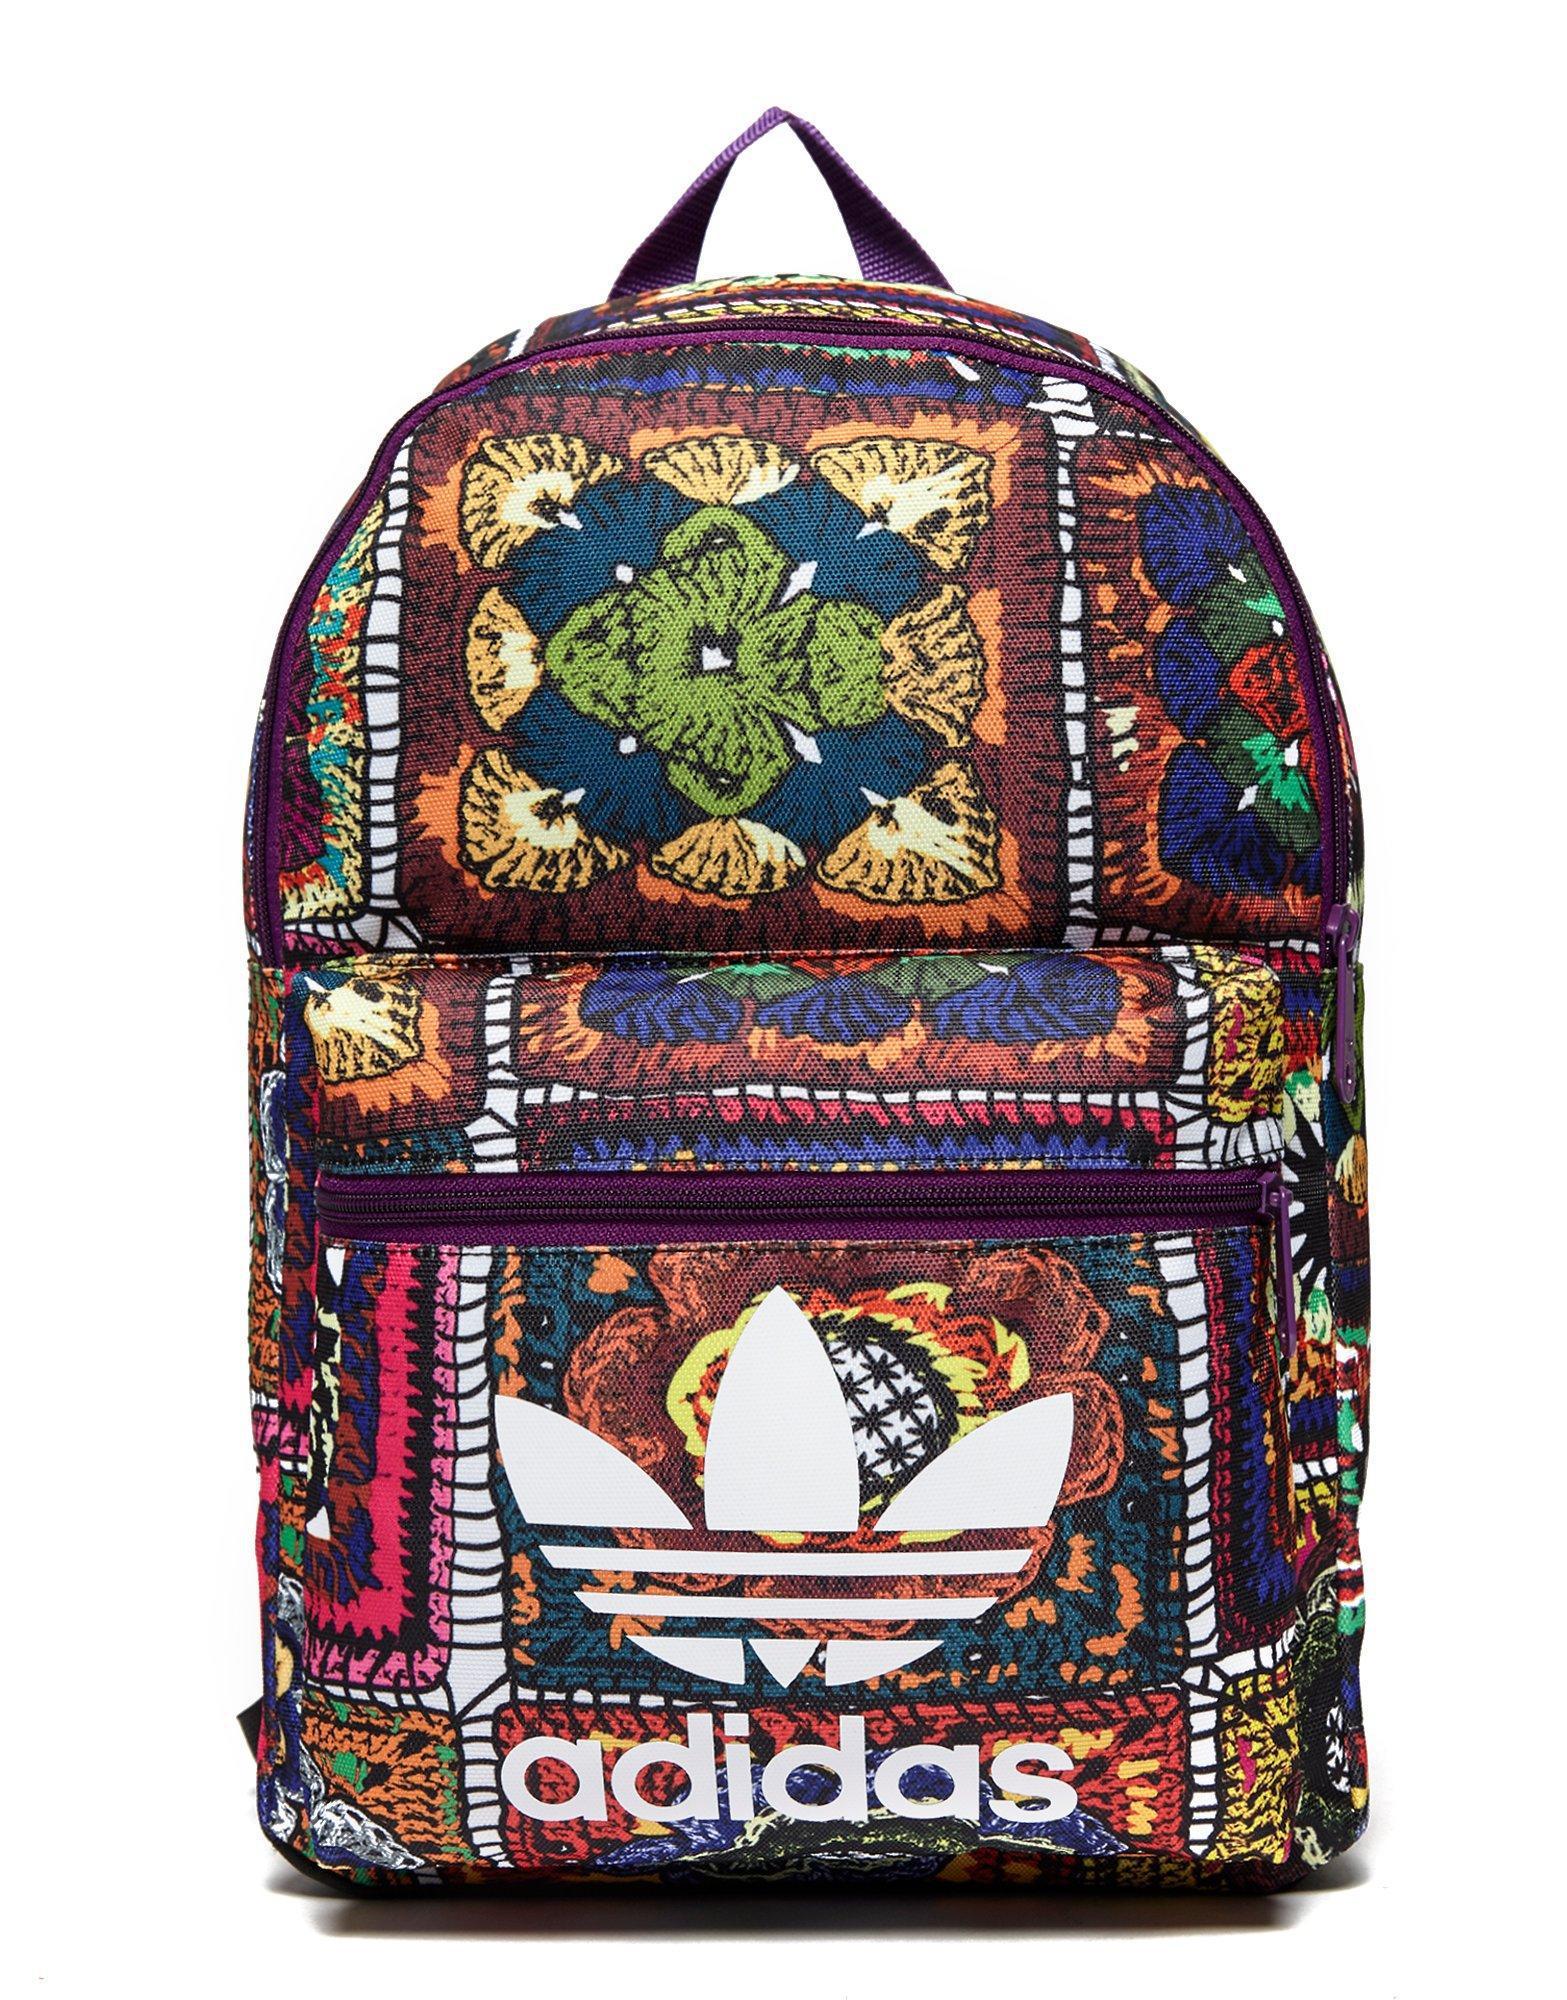 Lyst - adidas Originals Crochita Classic Backpack 3551484ce583c